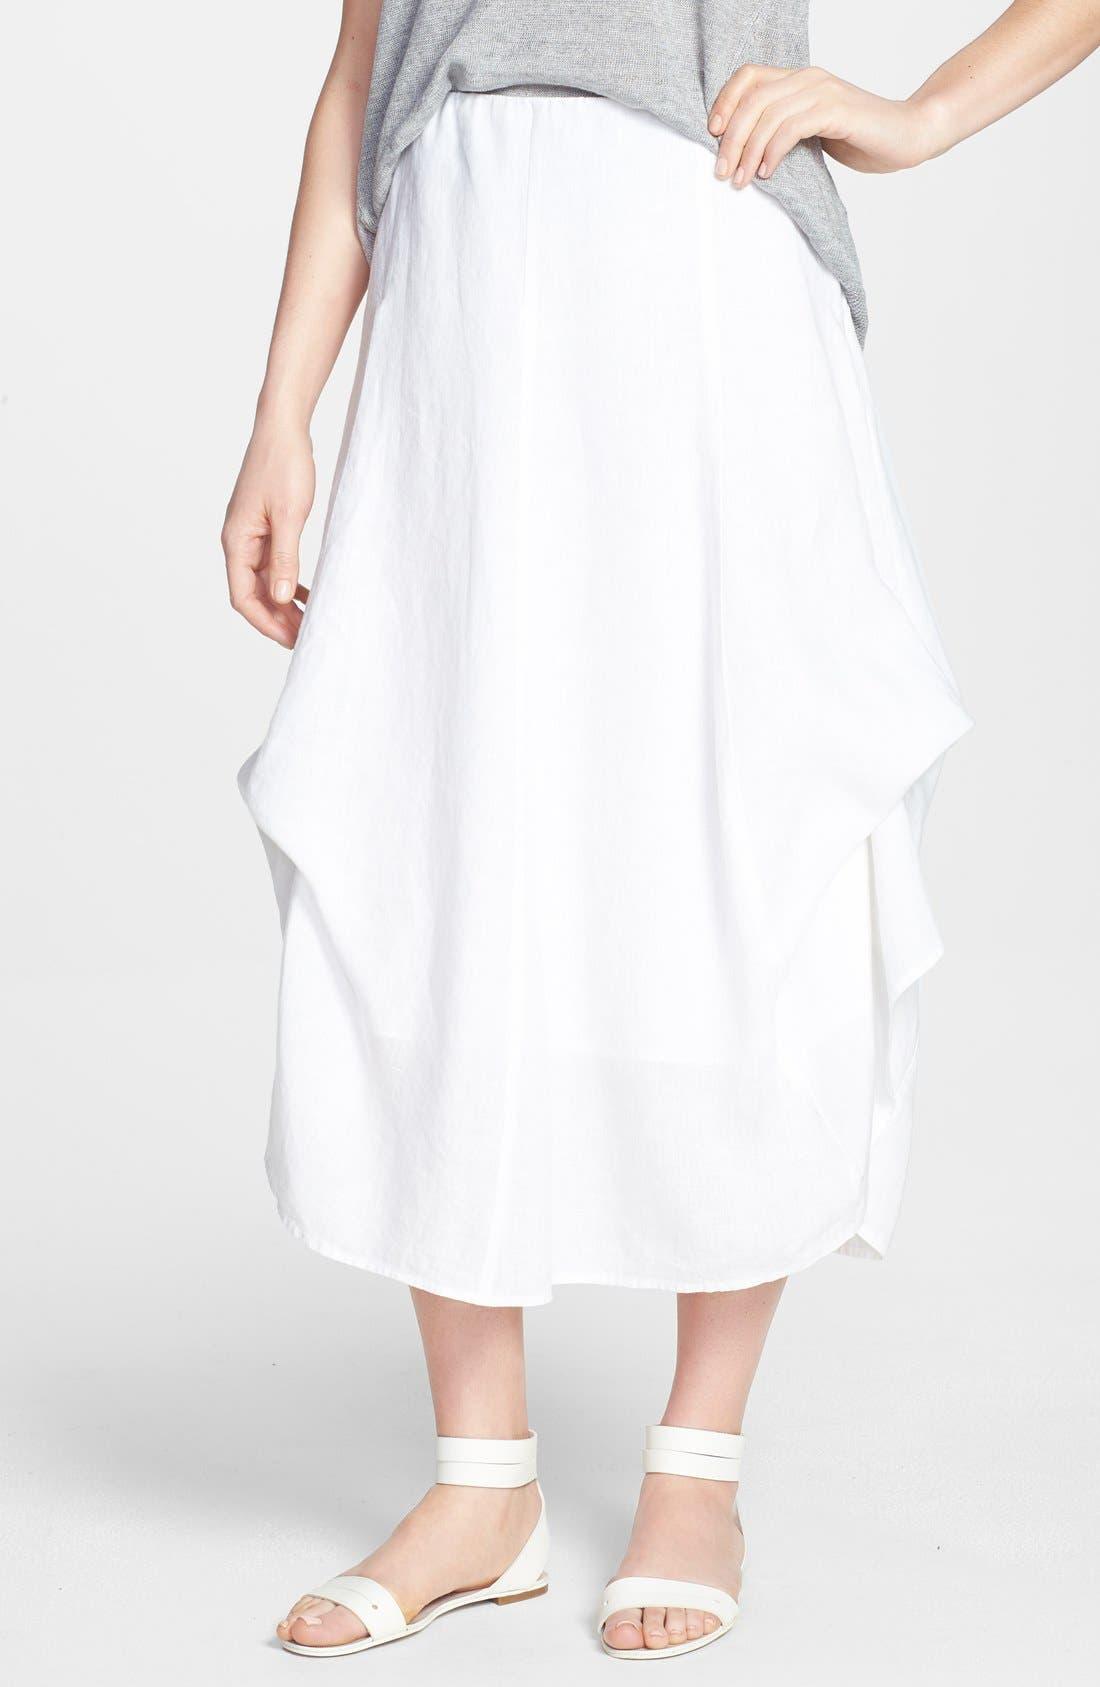 Alternate Image 1 Selected - Eileen Fisher A-Line Linen Skirt (Regular & Petite)